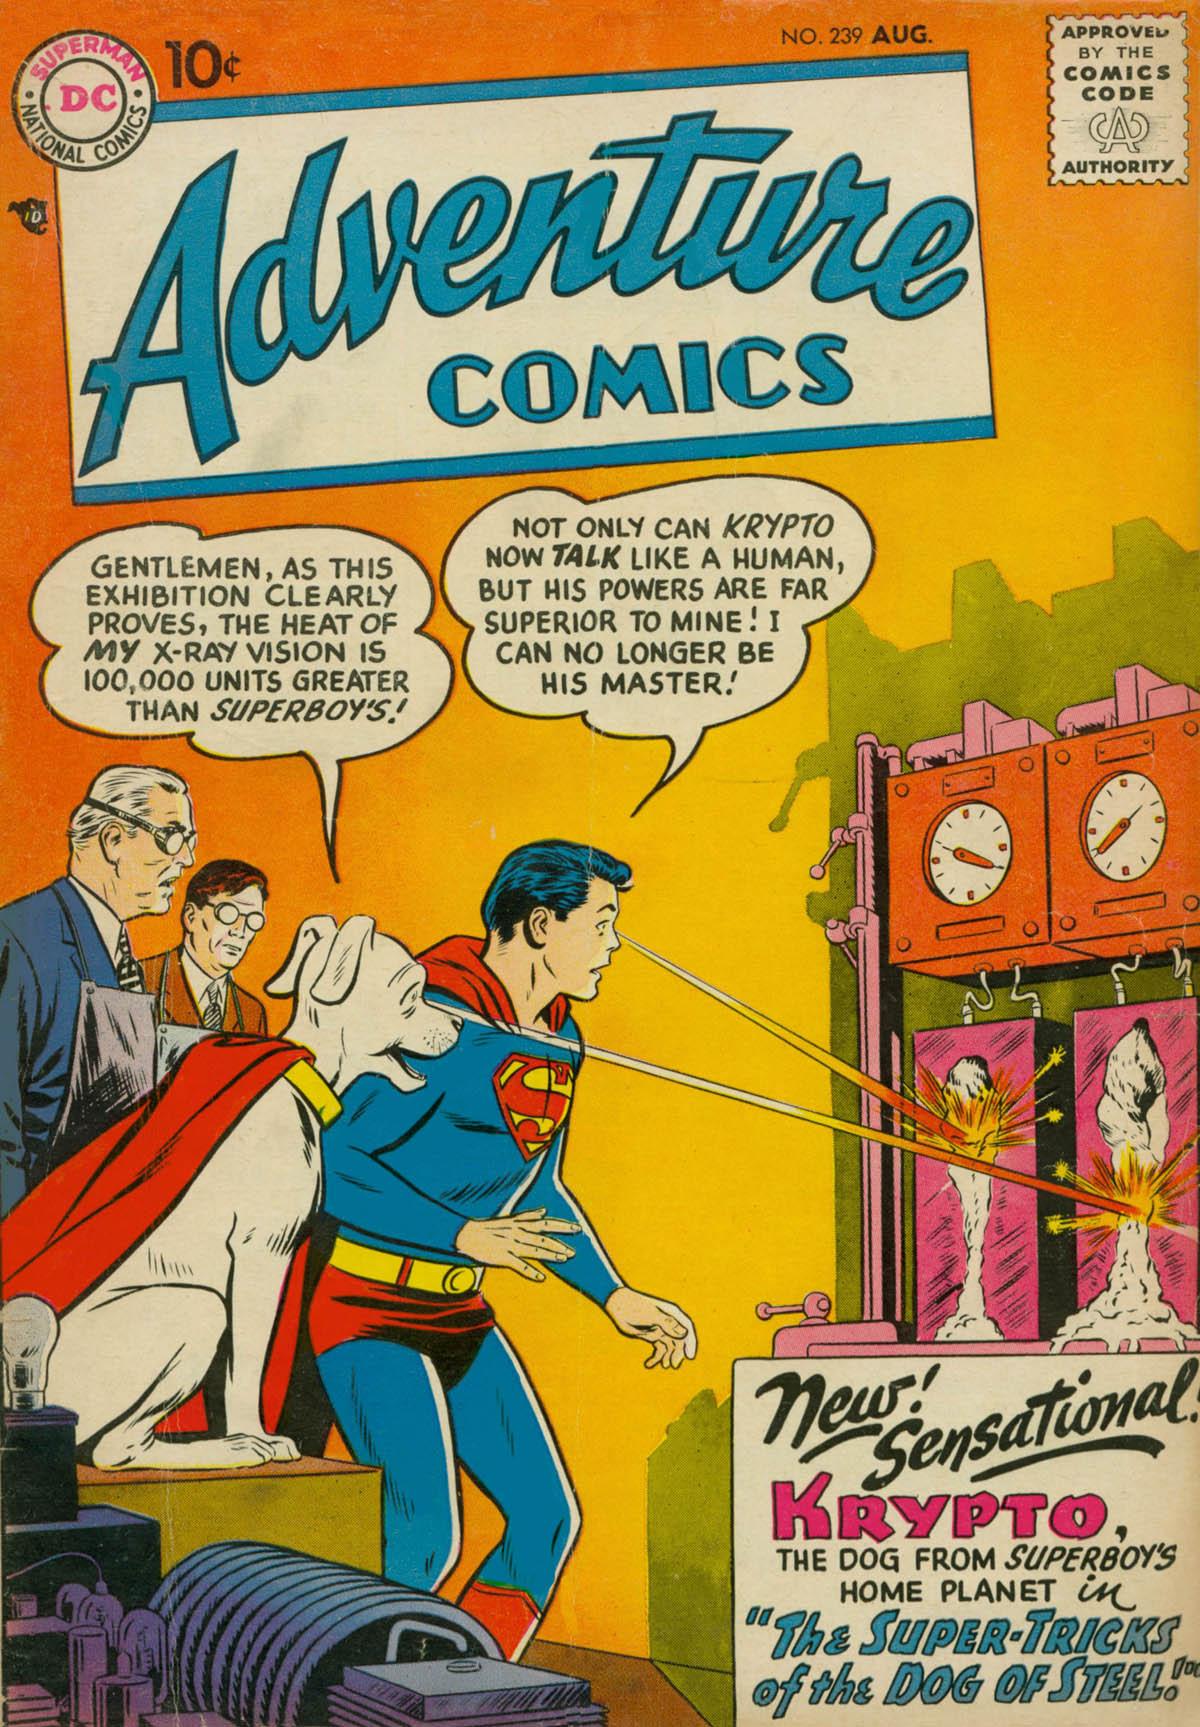 Read online Adventure Comics (1938) comic -  Issue #239 - 1